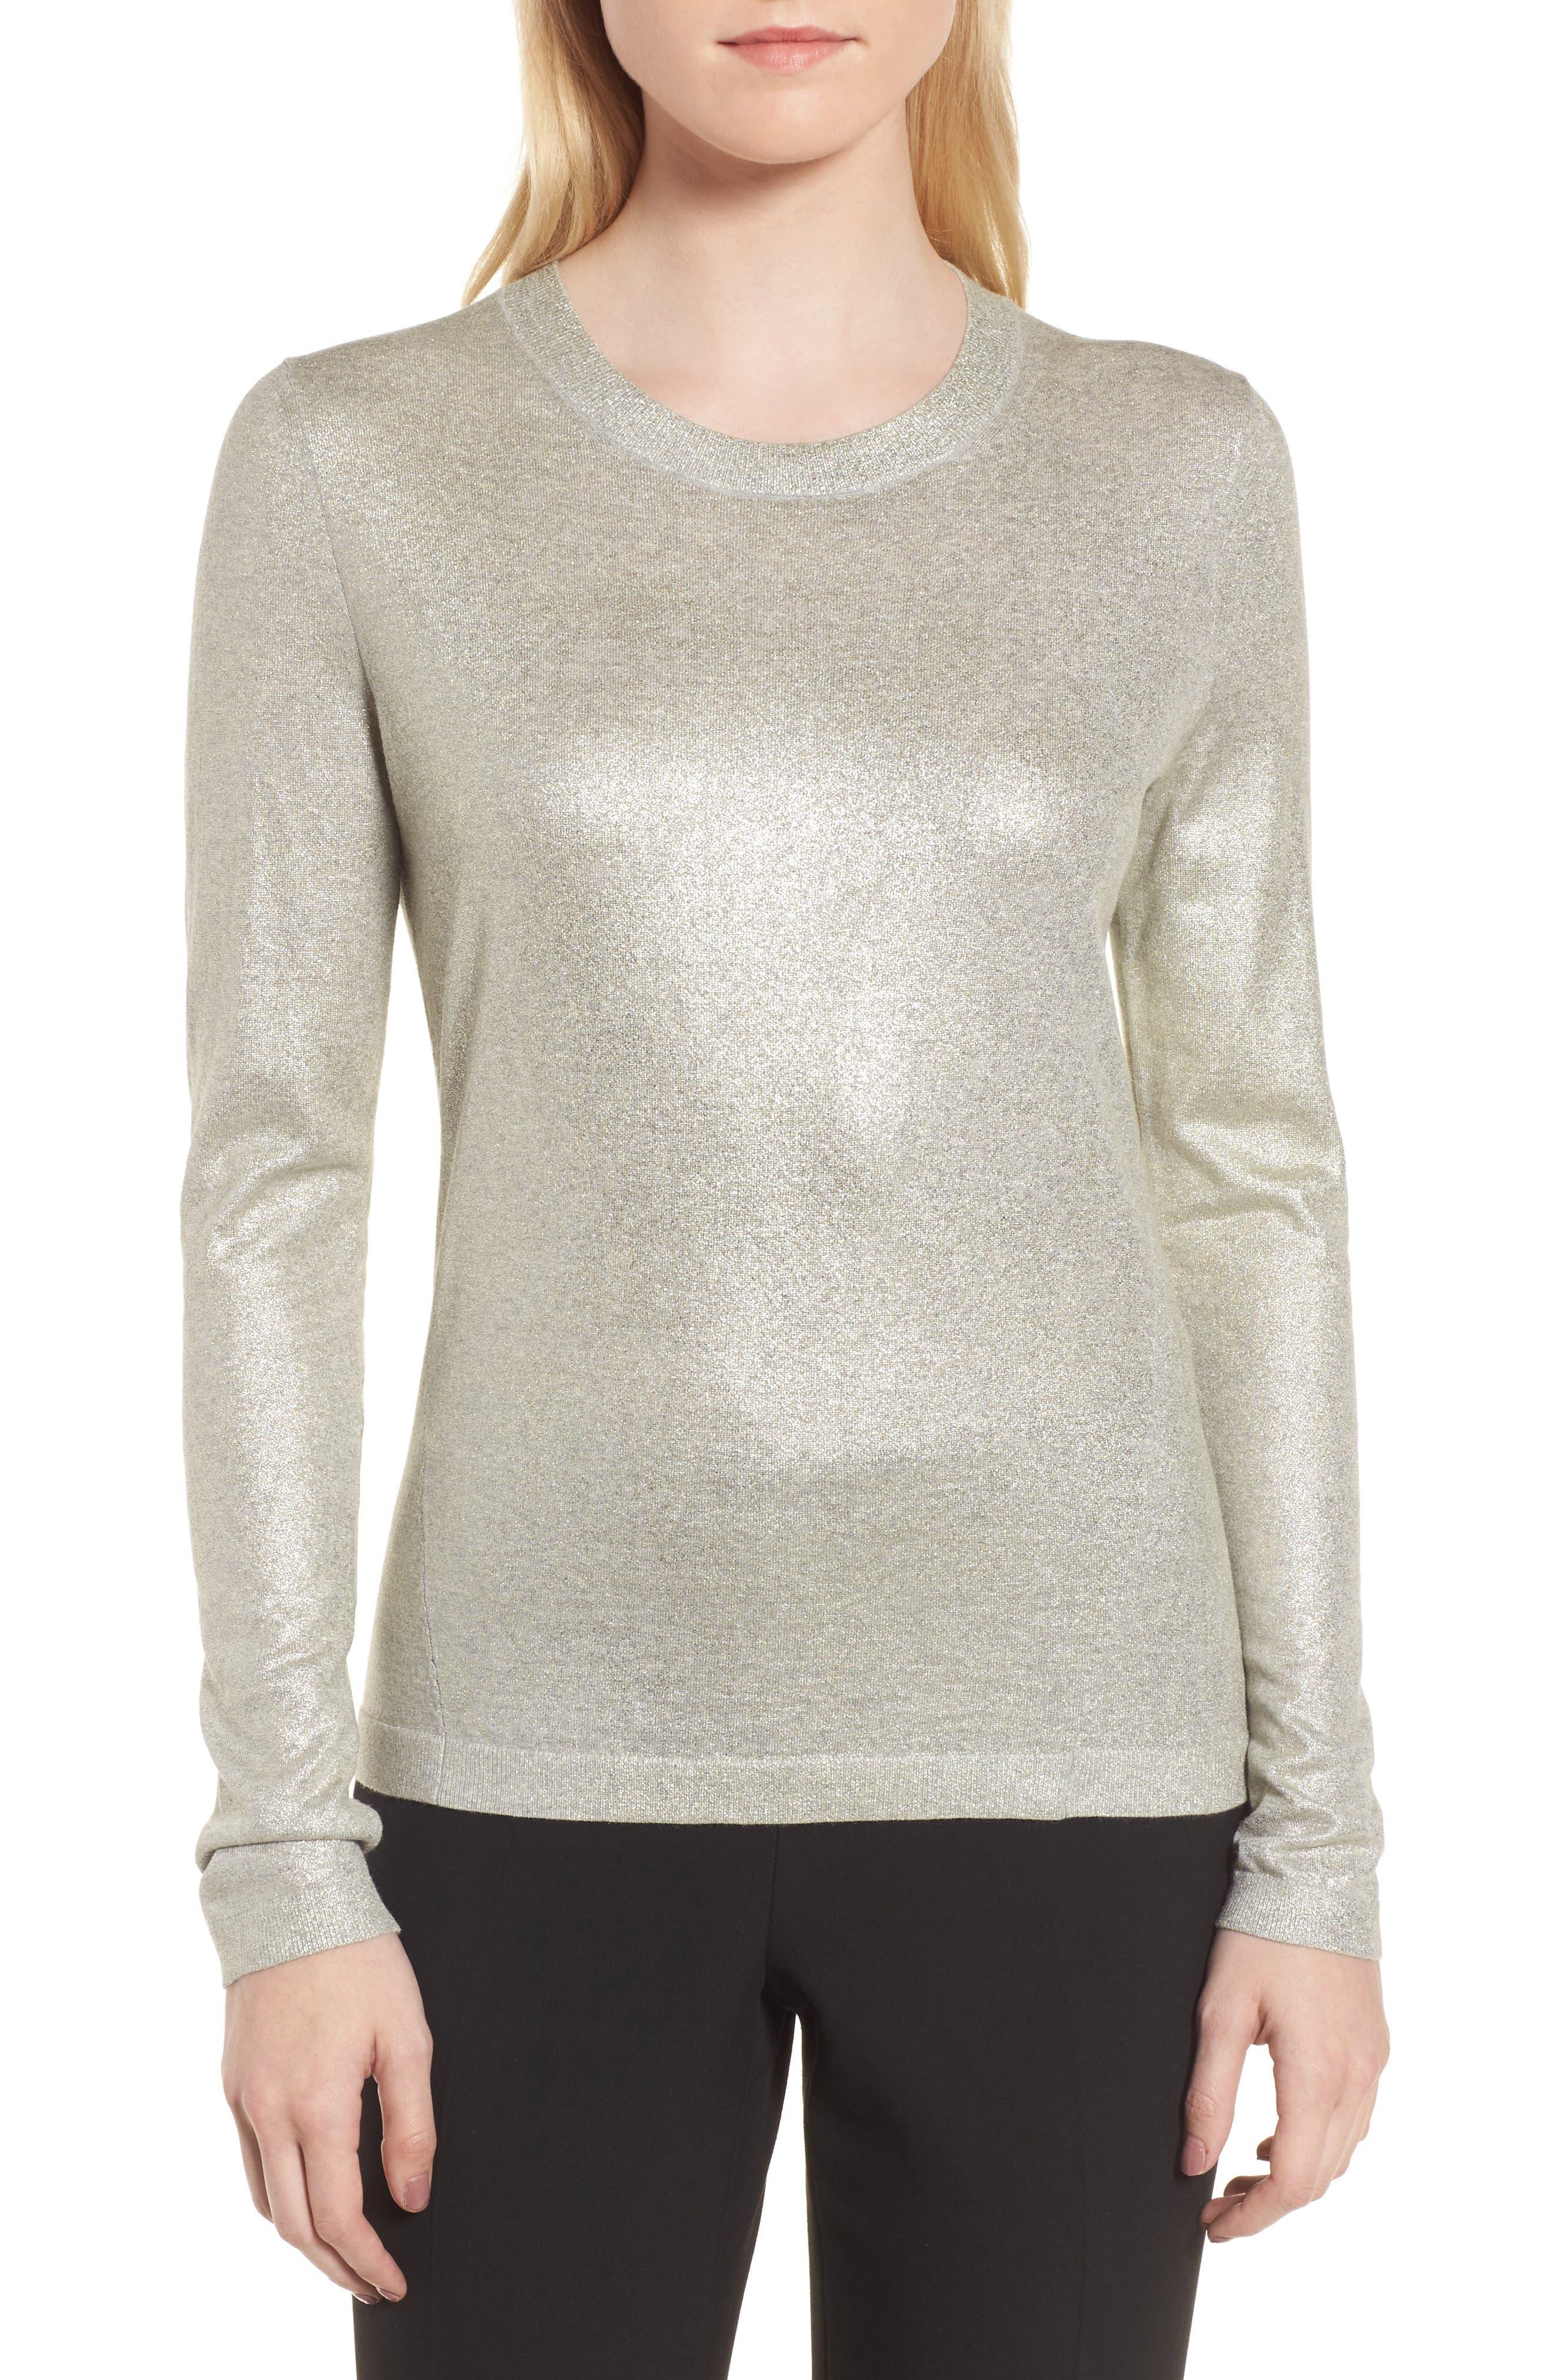 Fadine Wool Crewneck Sweater,                         Main,                         color, Cozy Grey Melange